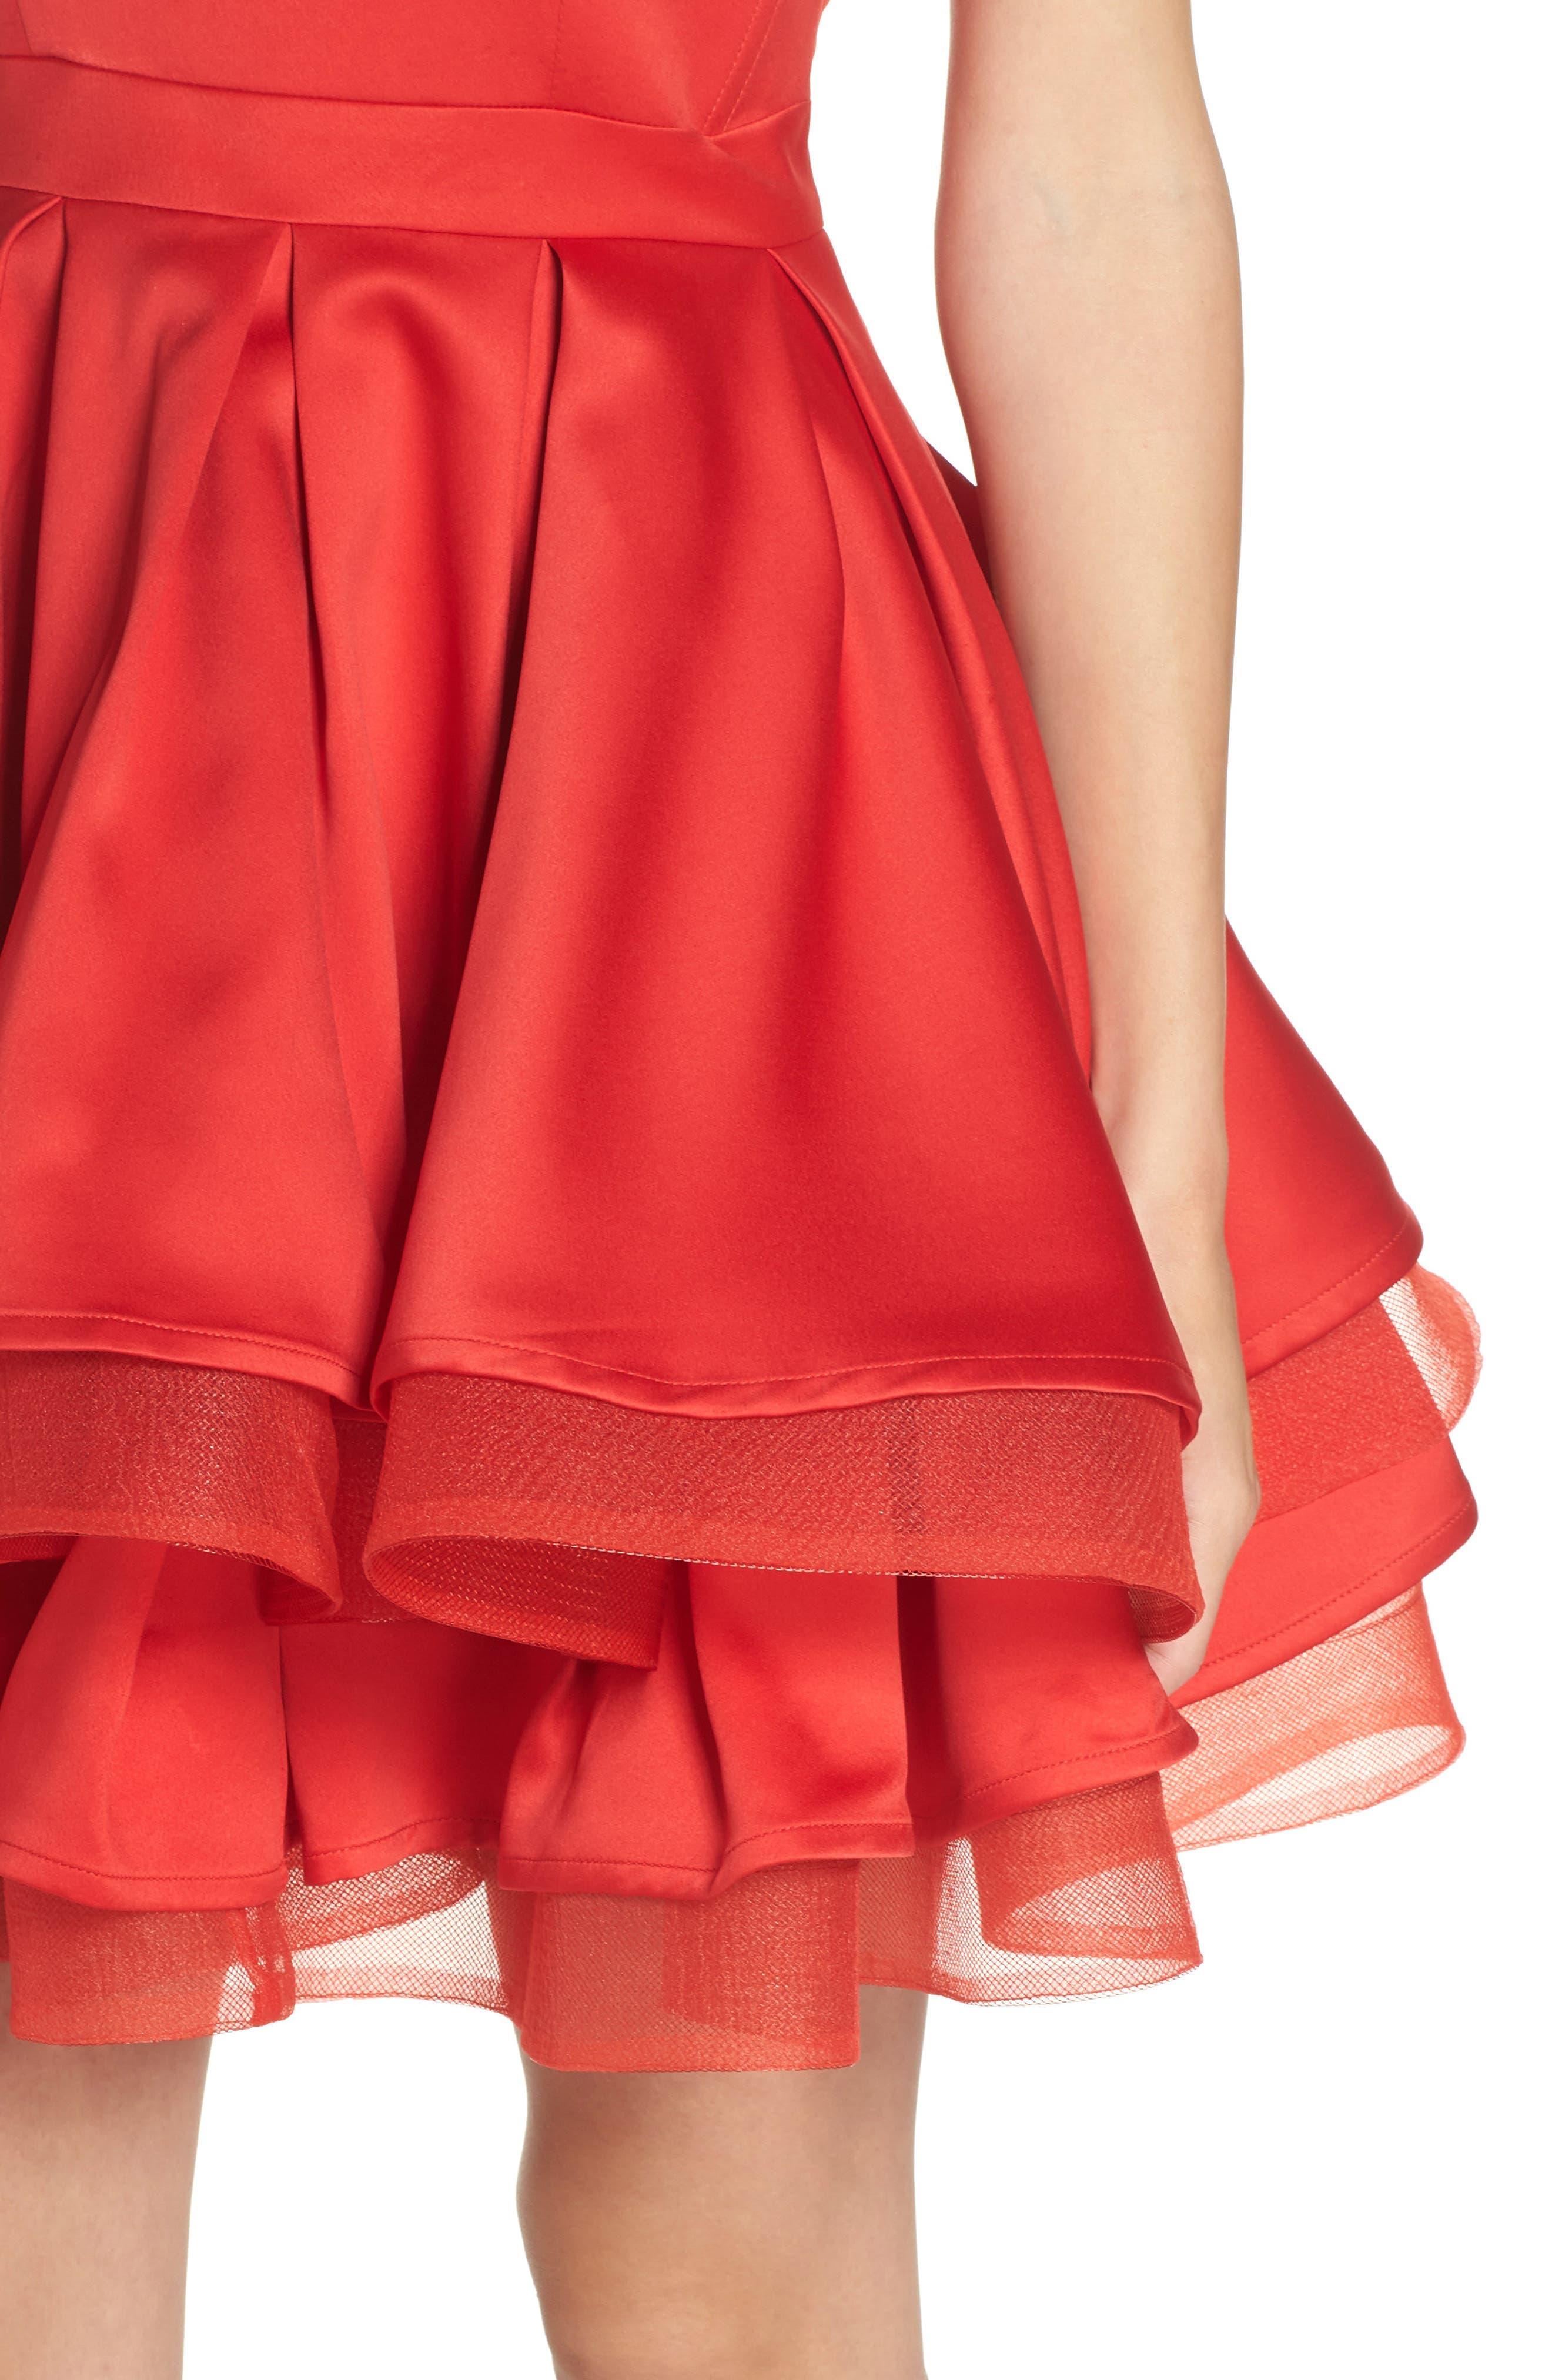 Emmanuel One-Shoulder Party Dress,                             Alternate thumbnail 4, color,                             600